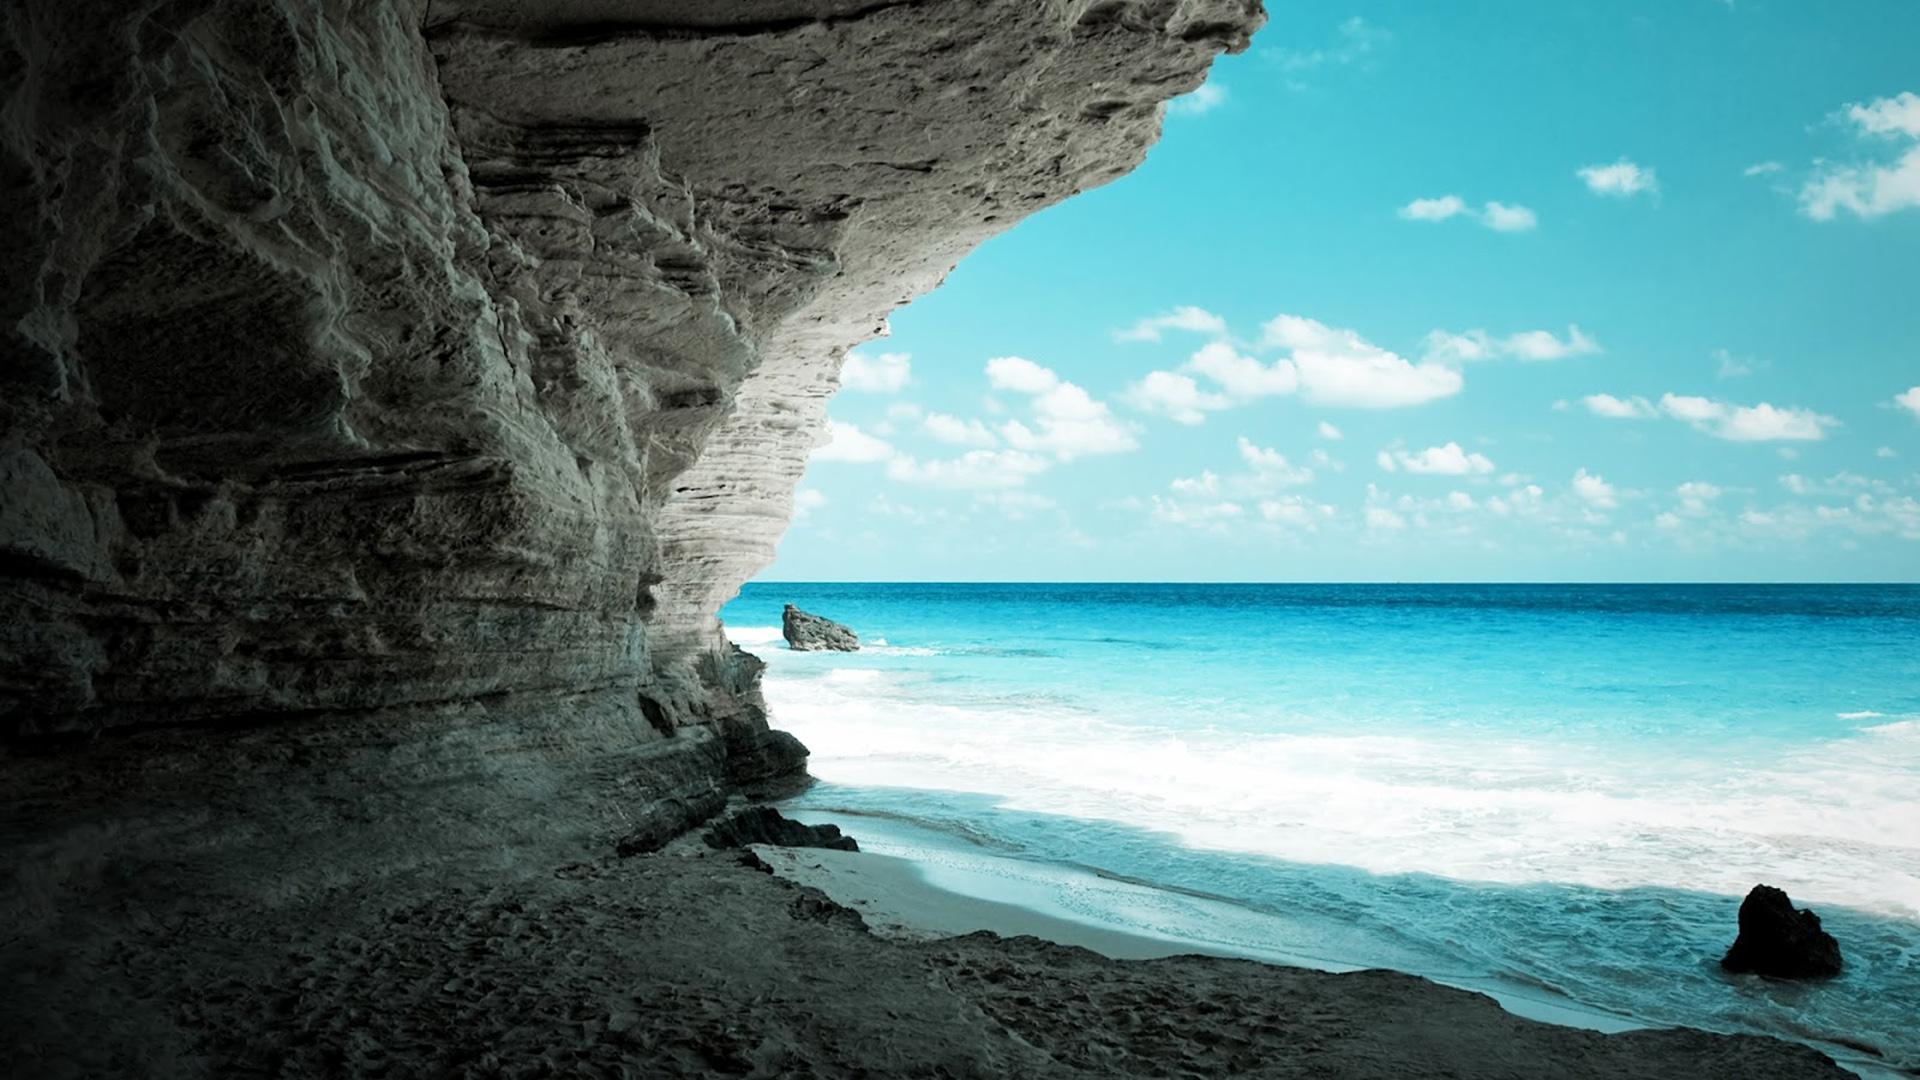 amazing photos beach wallpapers - photo #21